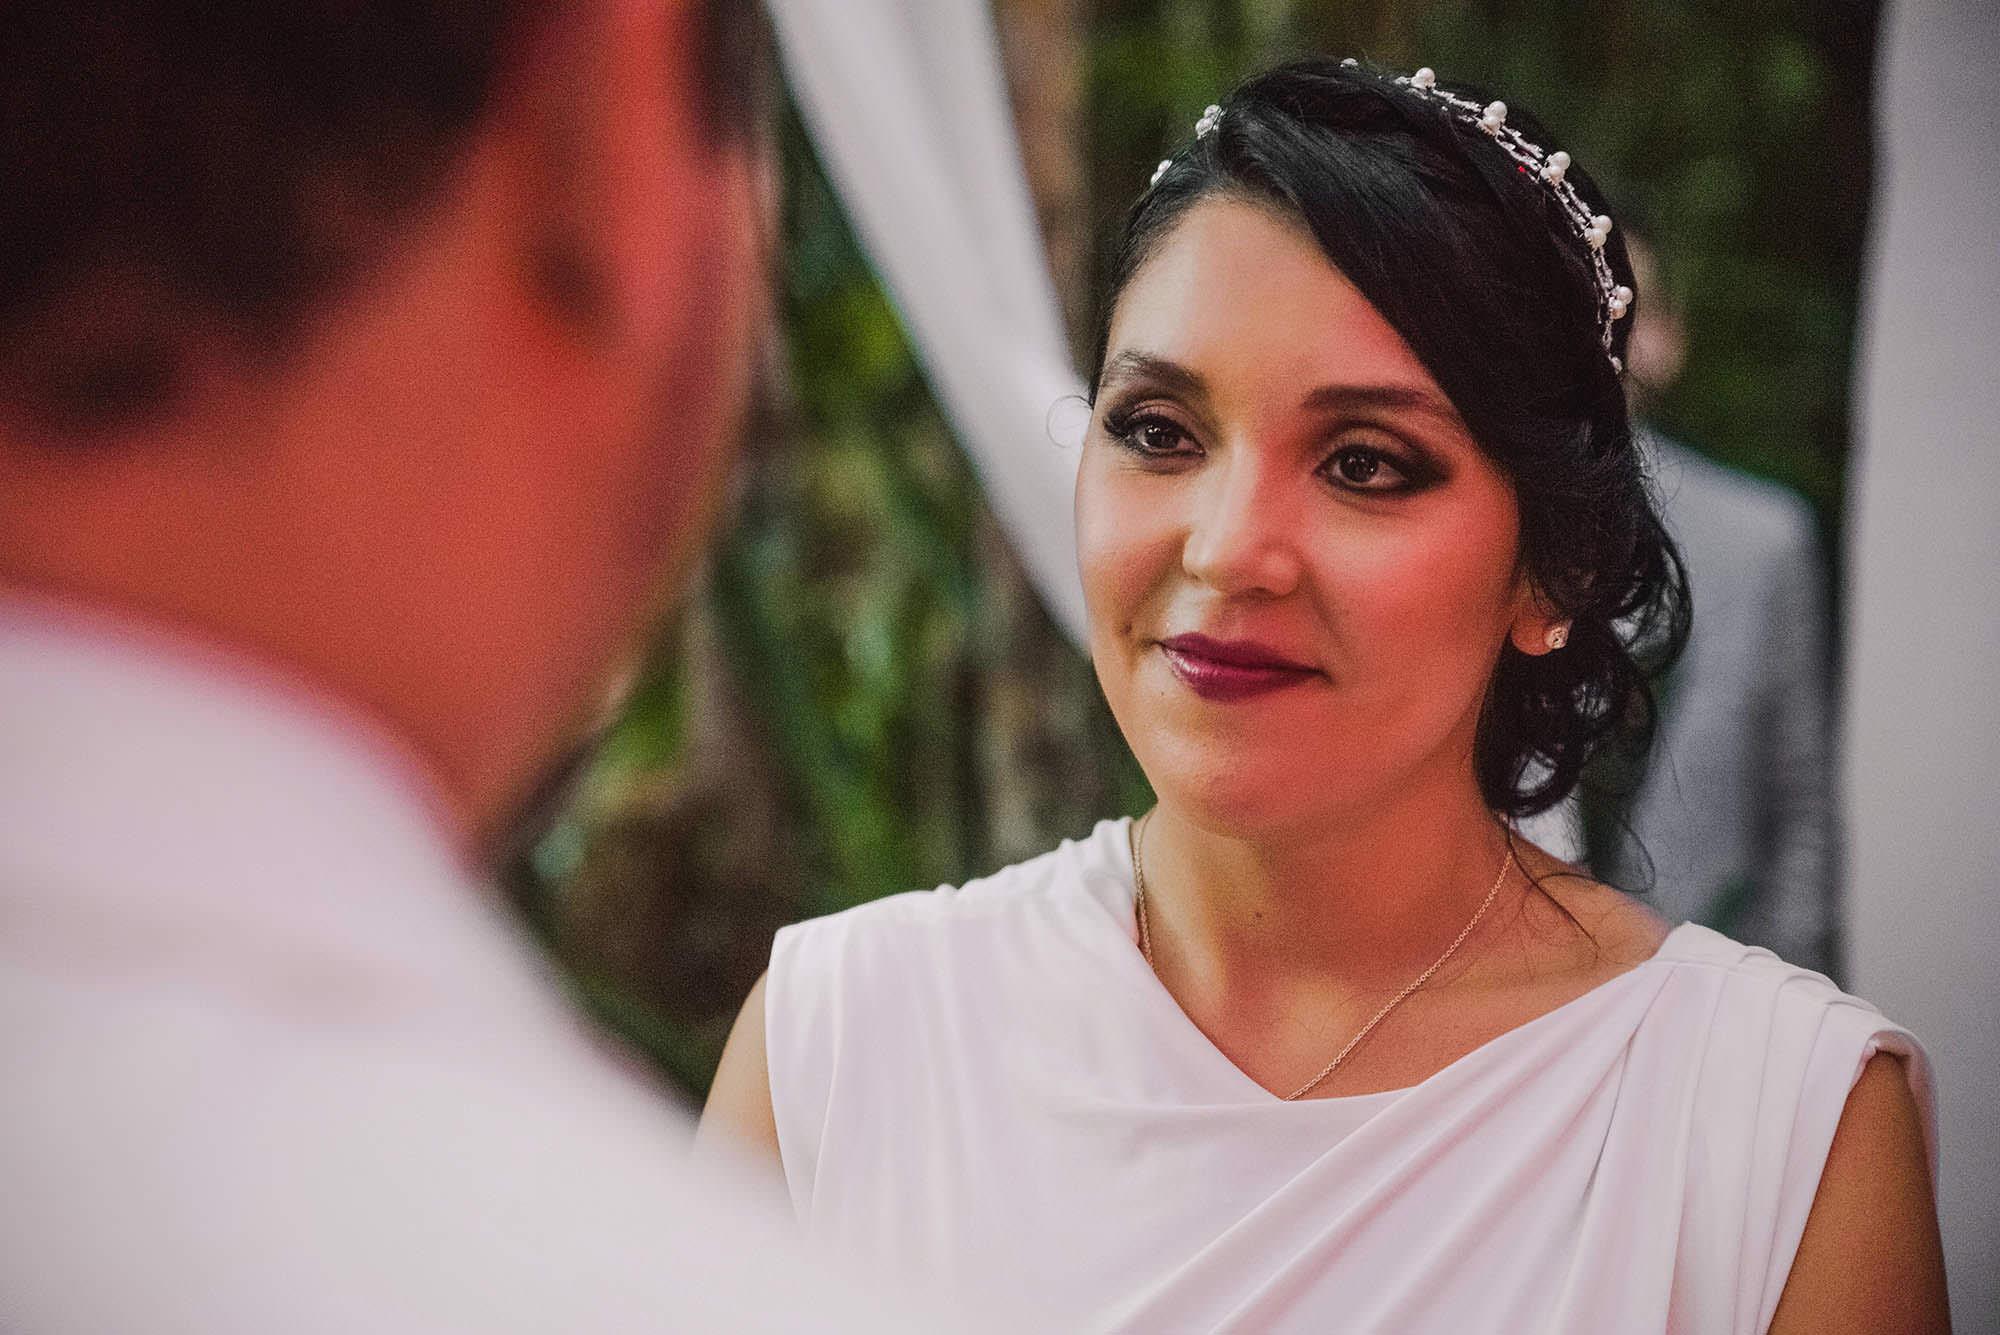 Wedding playa del carmen planner destination mexico magali espinosa36-WEB.jpg